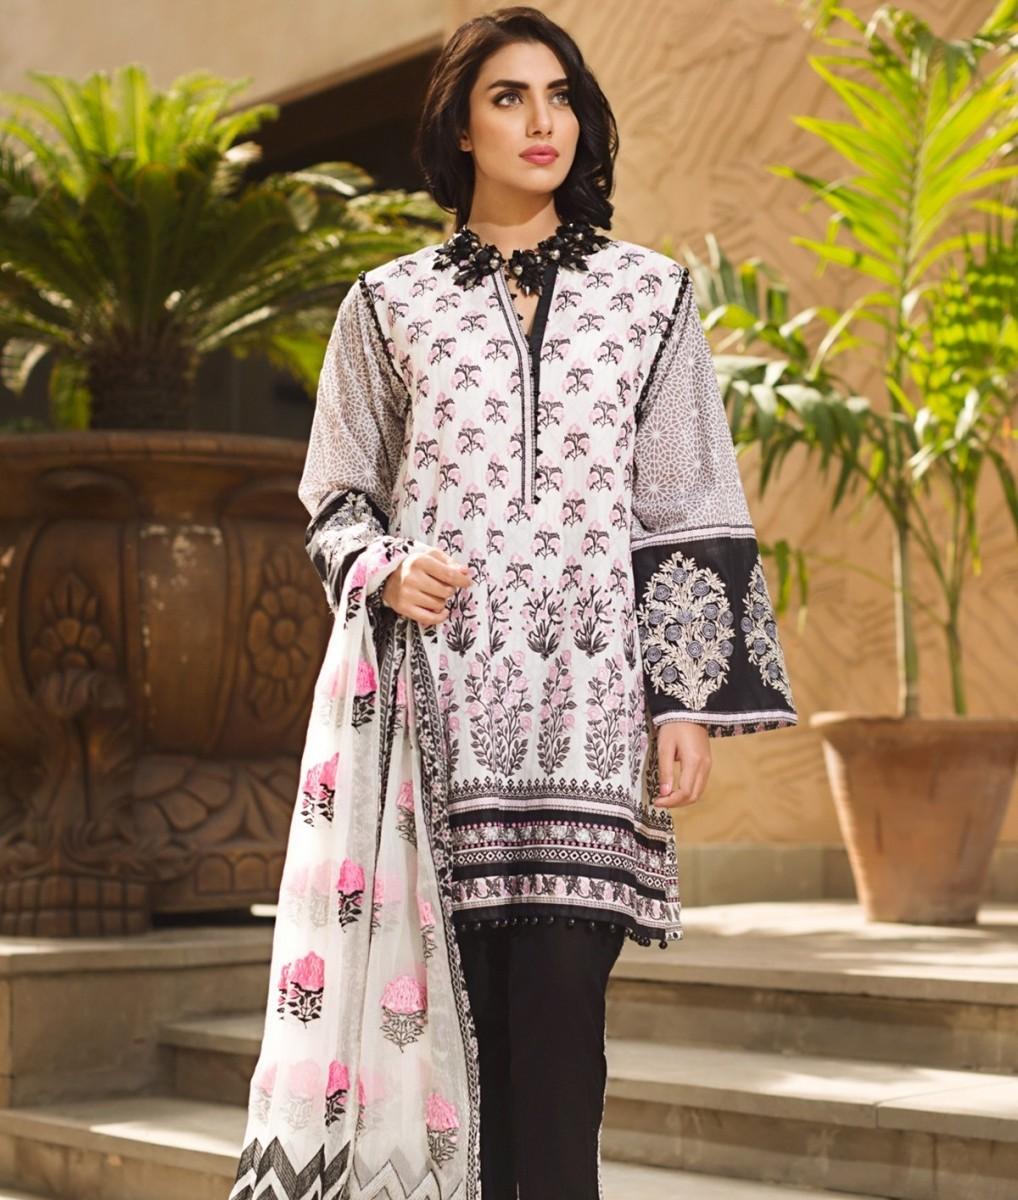 Khaadi three piece lawn Eid dress in black and white